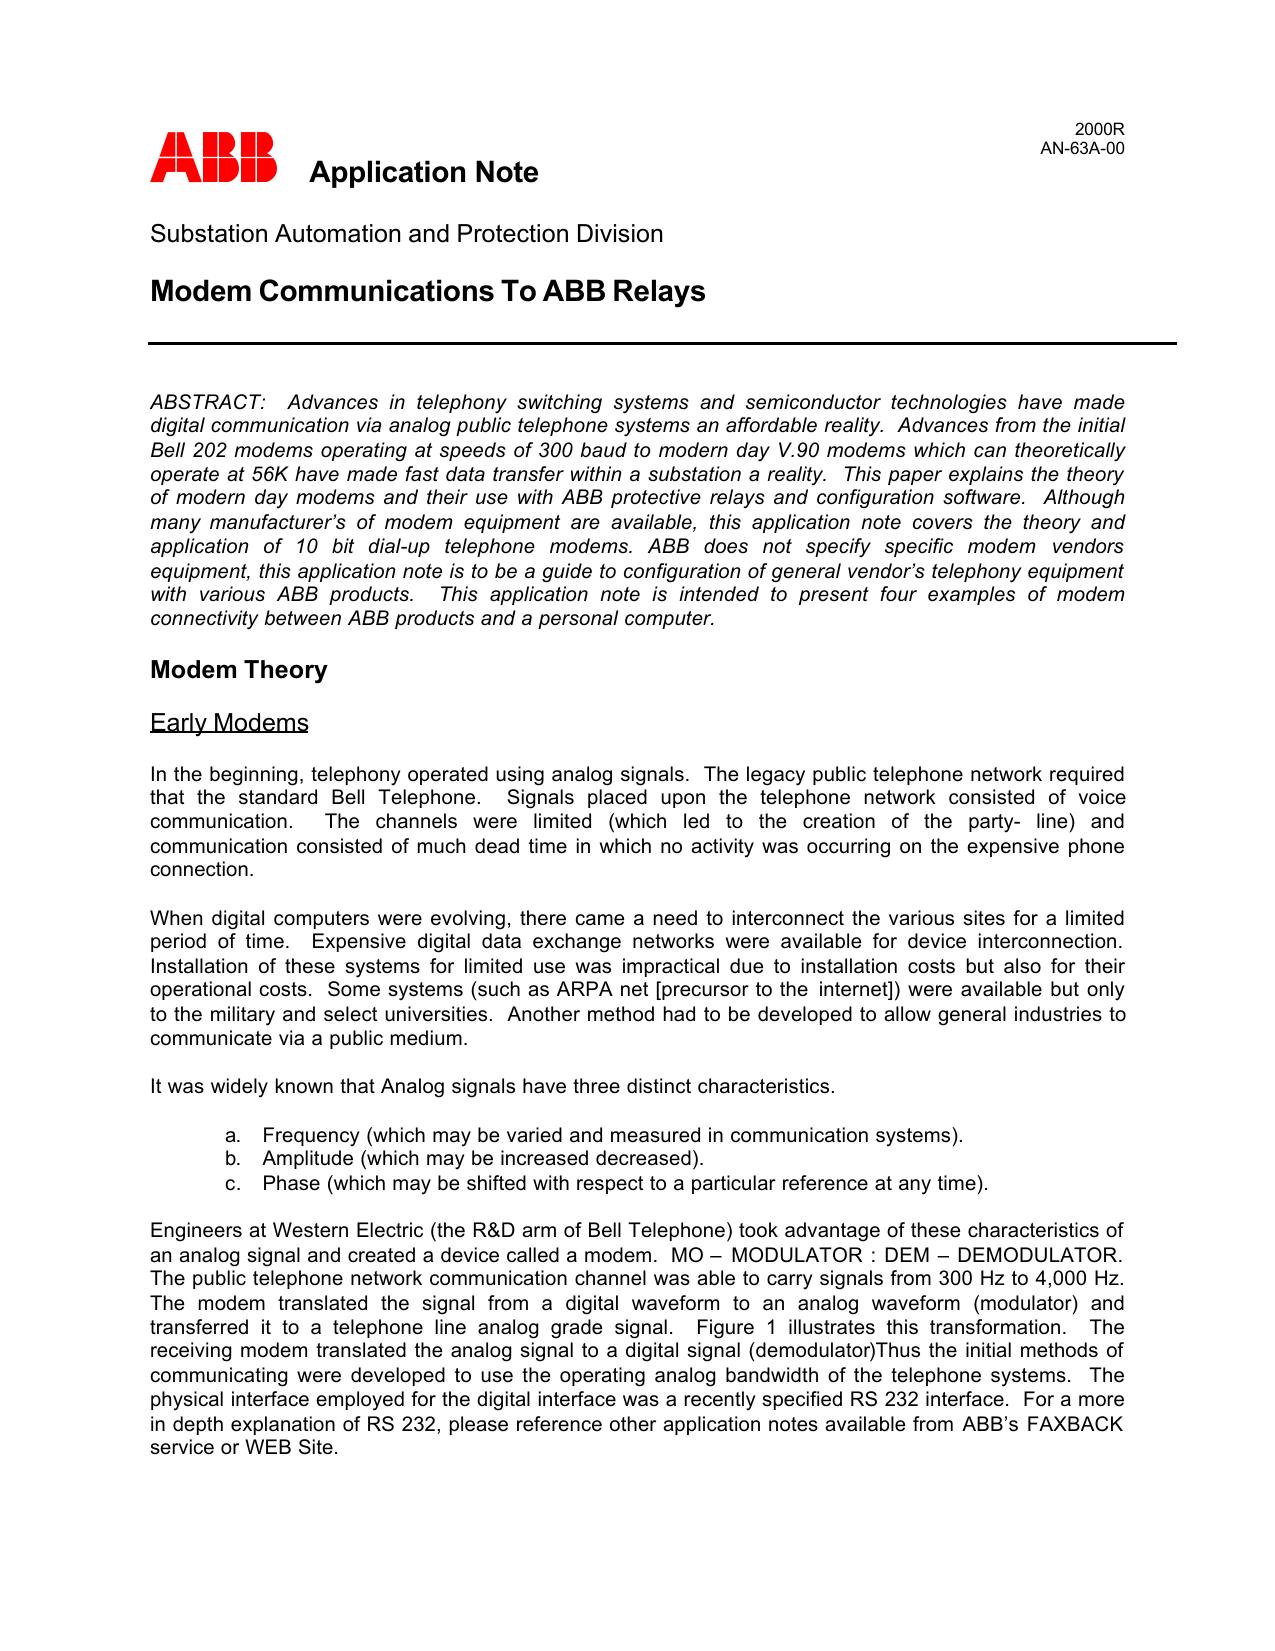 Modem Communications To ABB Relays ABB   manualzz.com on